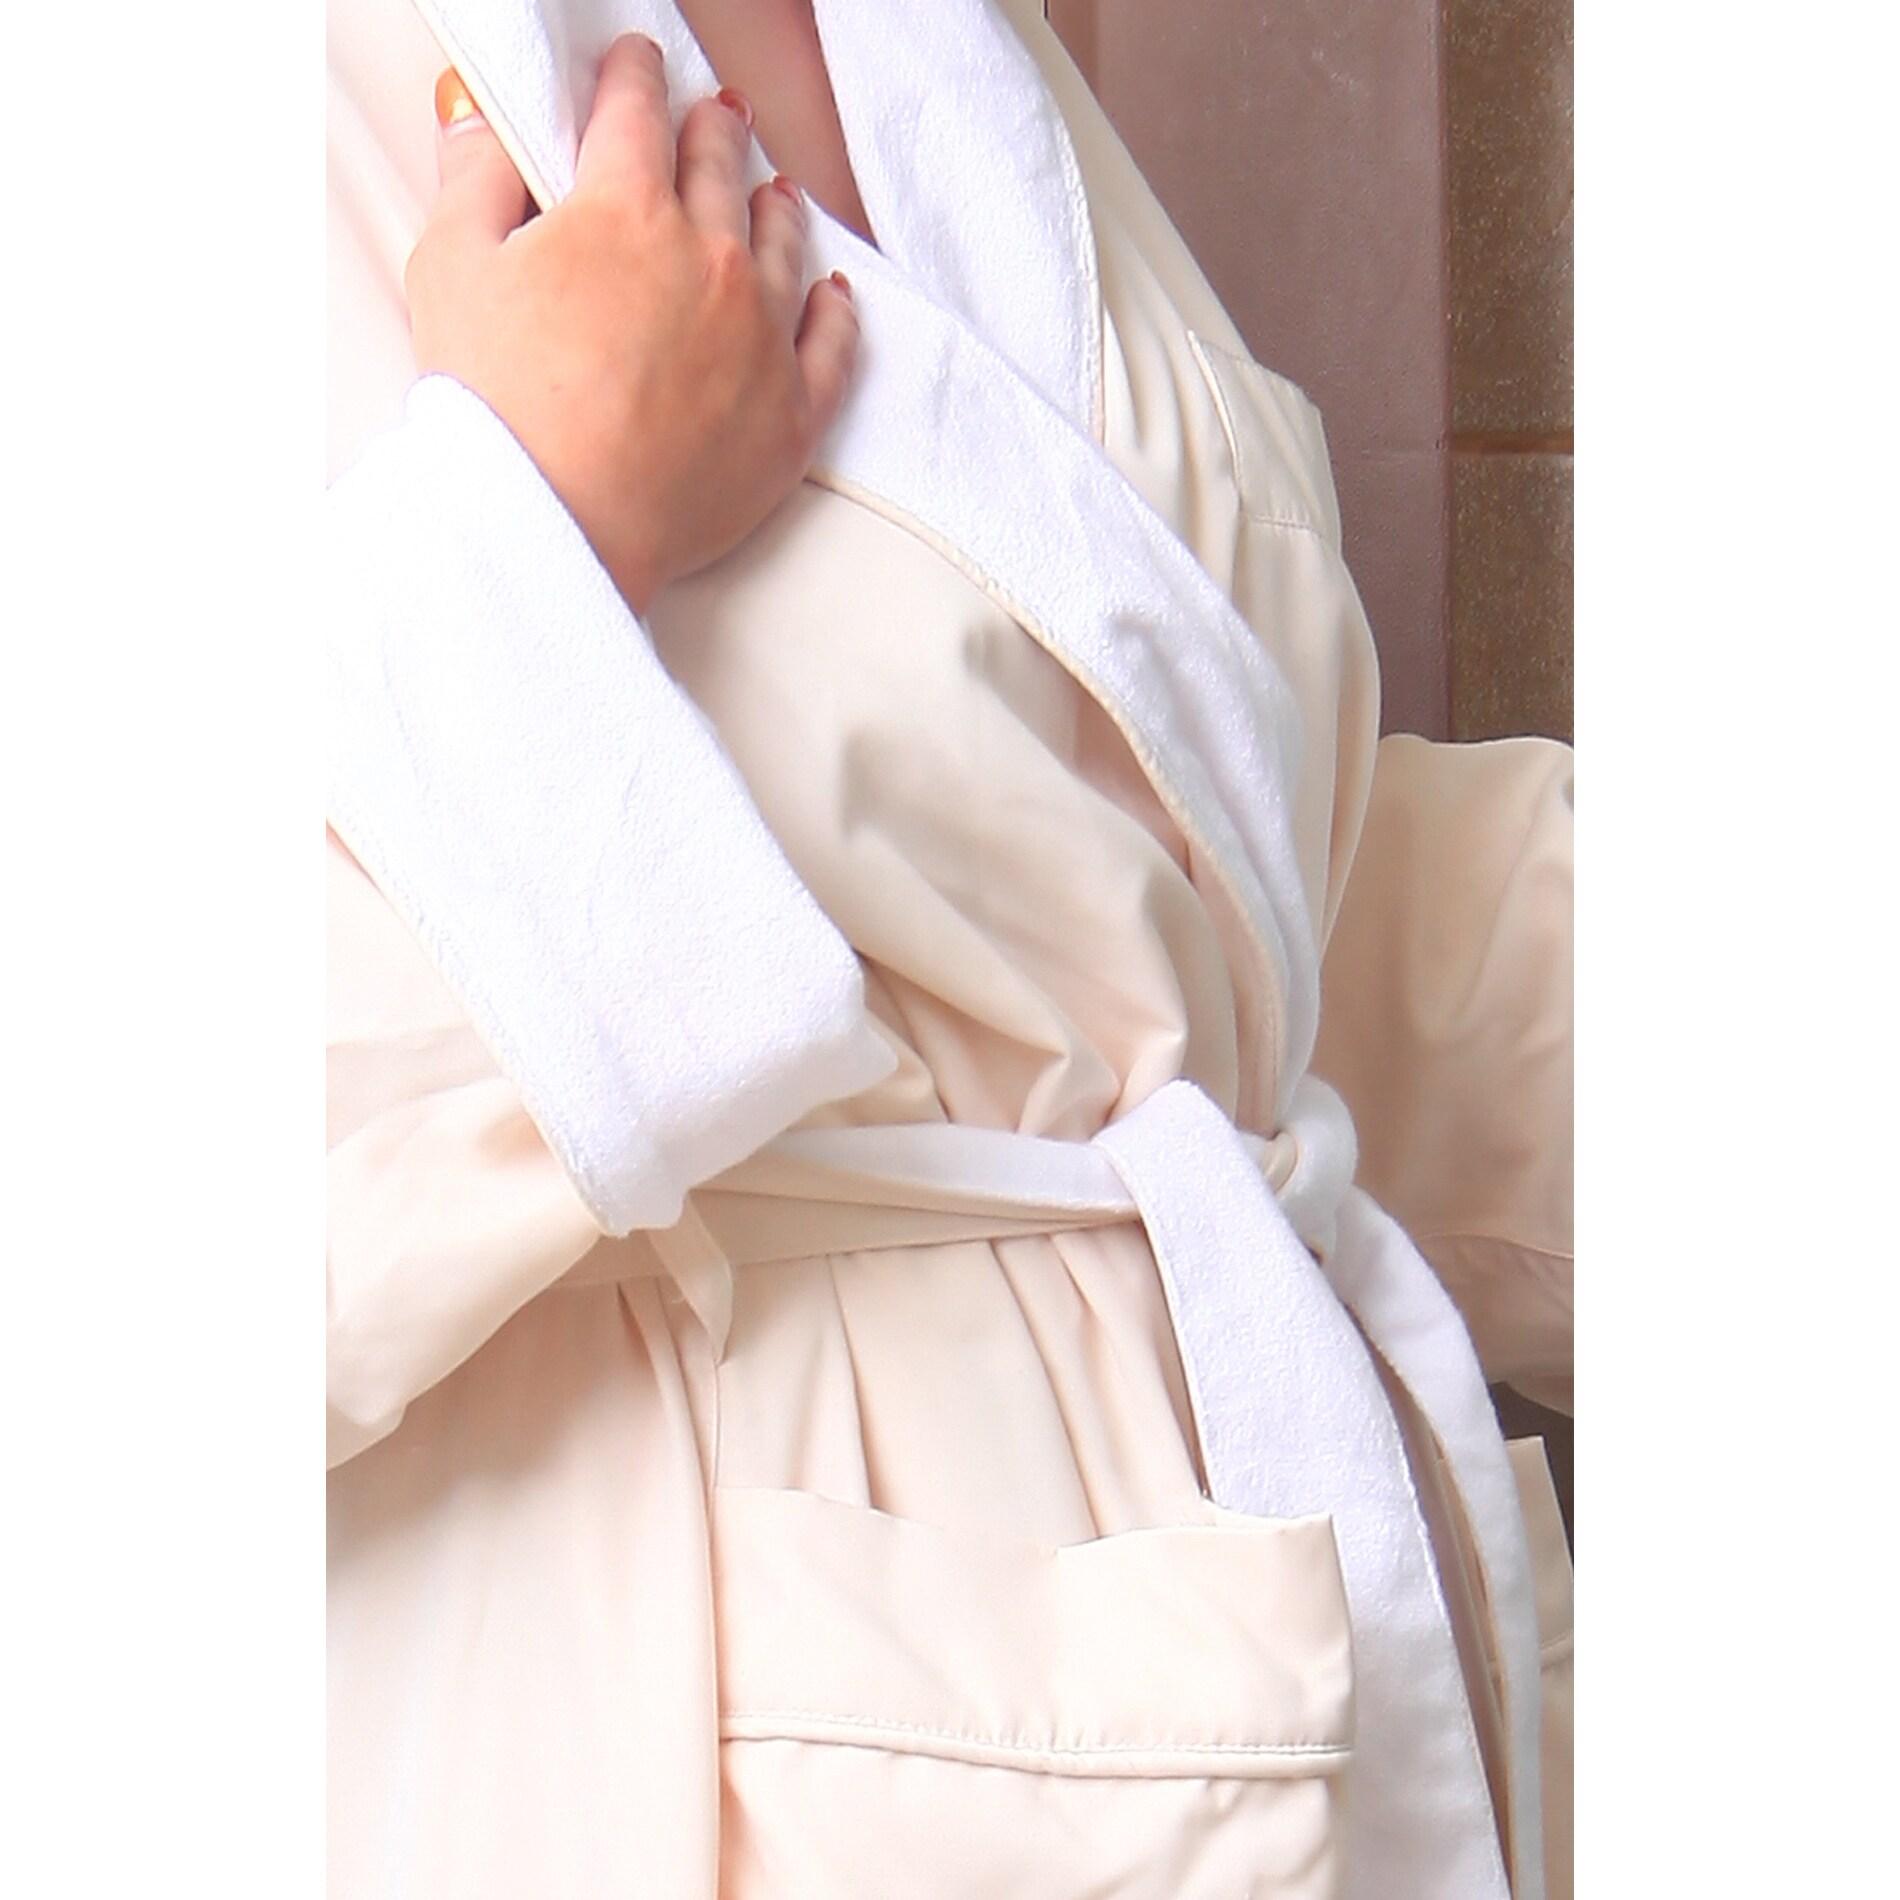 671ab62e4d Shop Home Spa Microfiber Velour-Lined Bath Robe